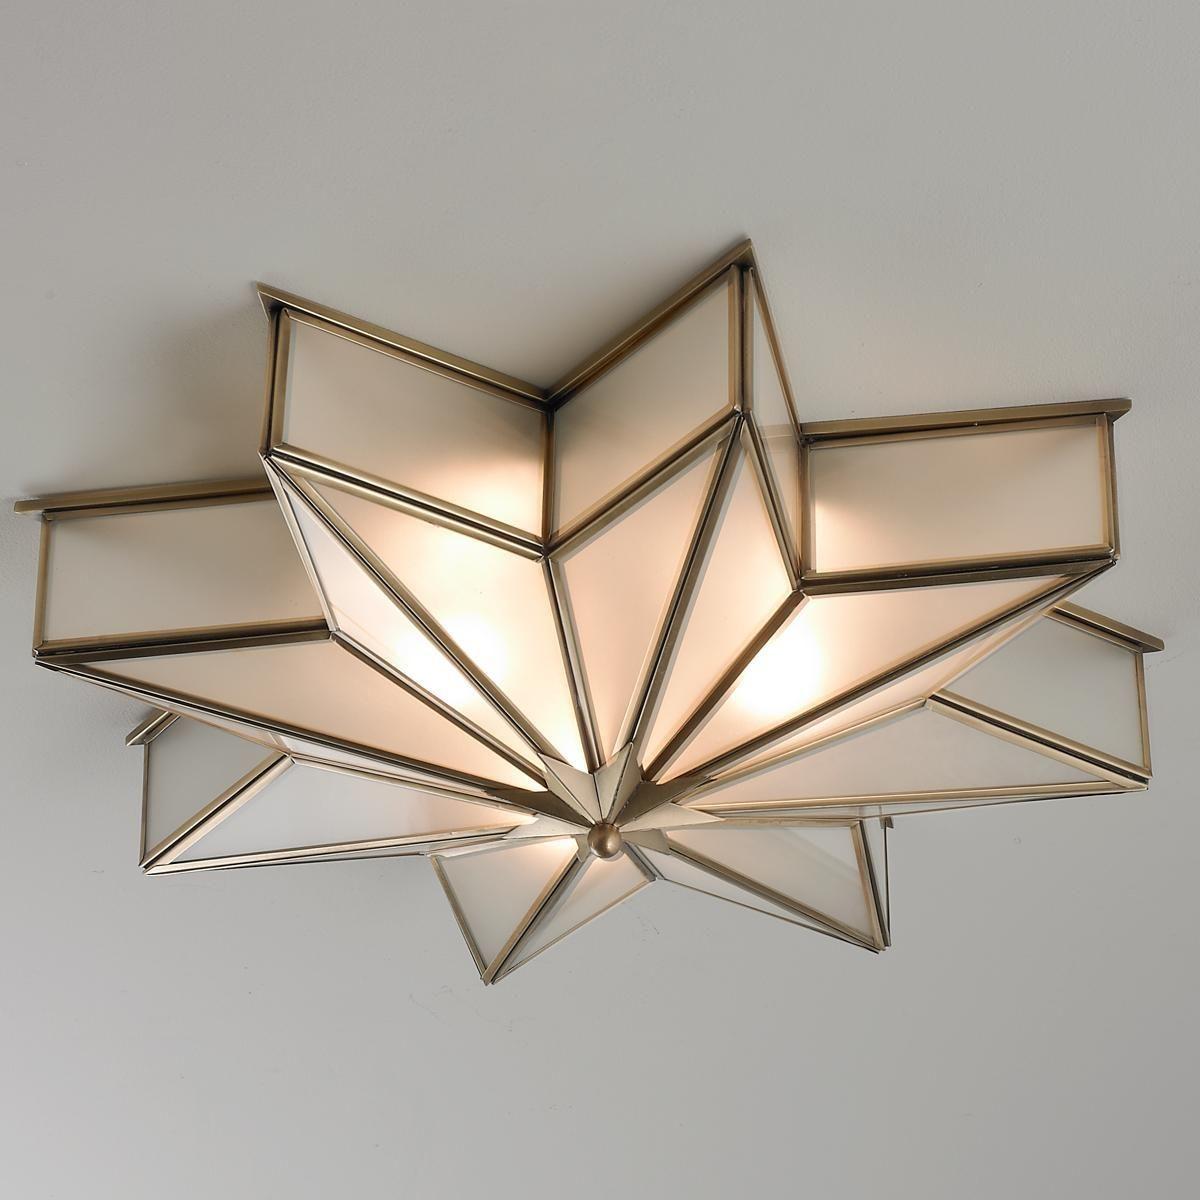 Glass Star Ceiling Light Star Lights On Ceiling Star Ceiling Star Chandelier Star flush mount light